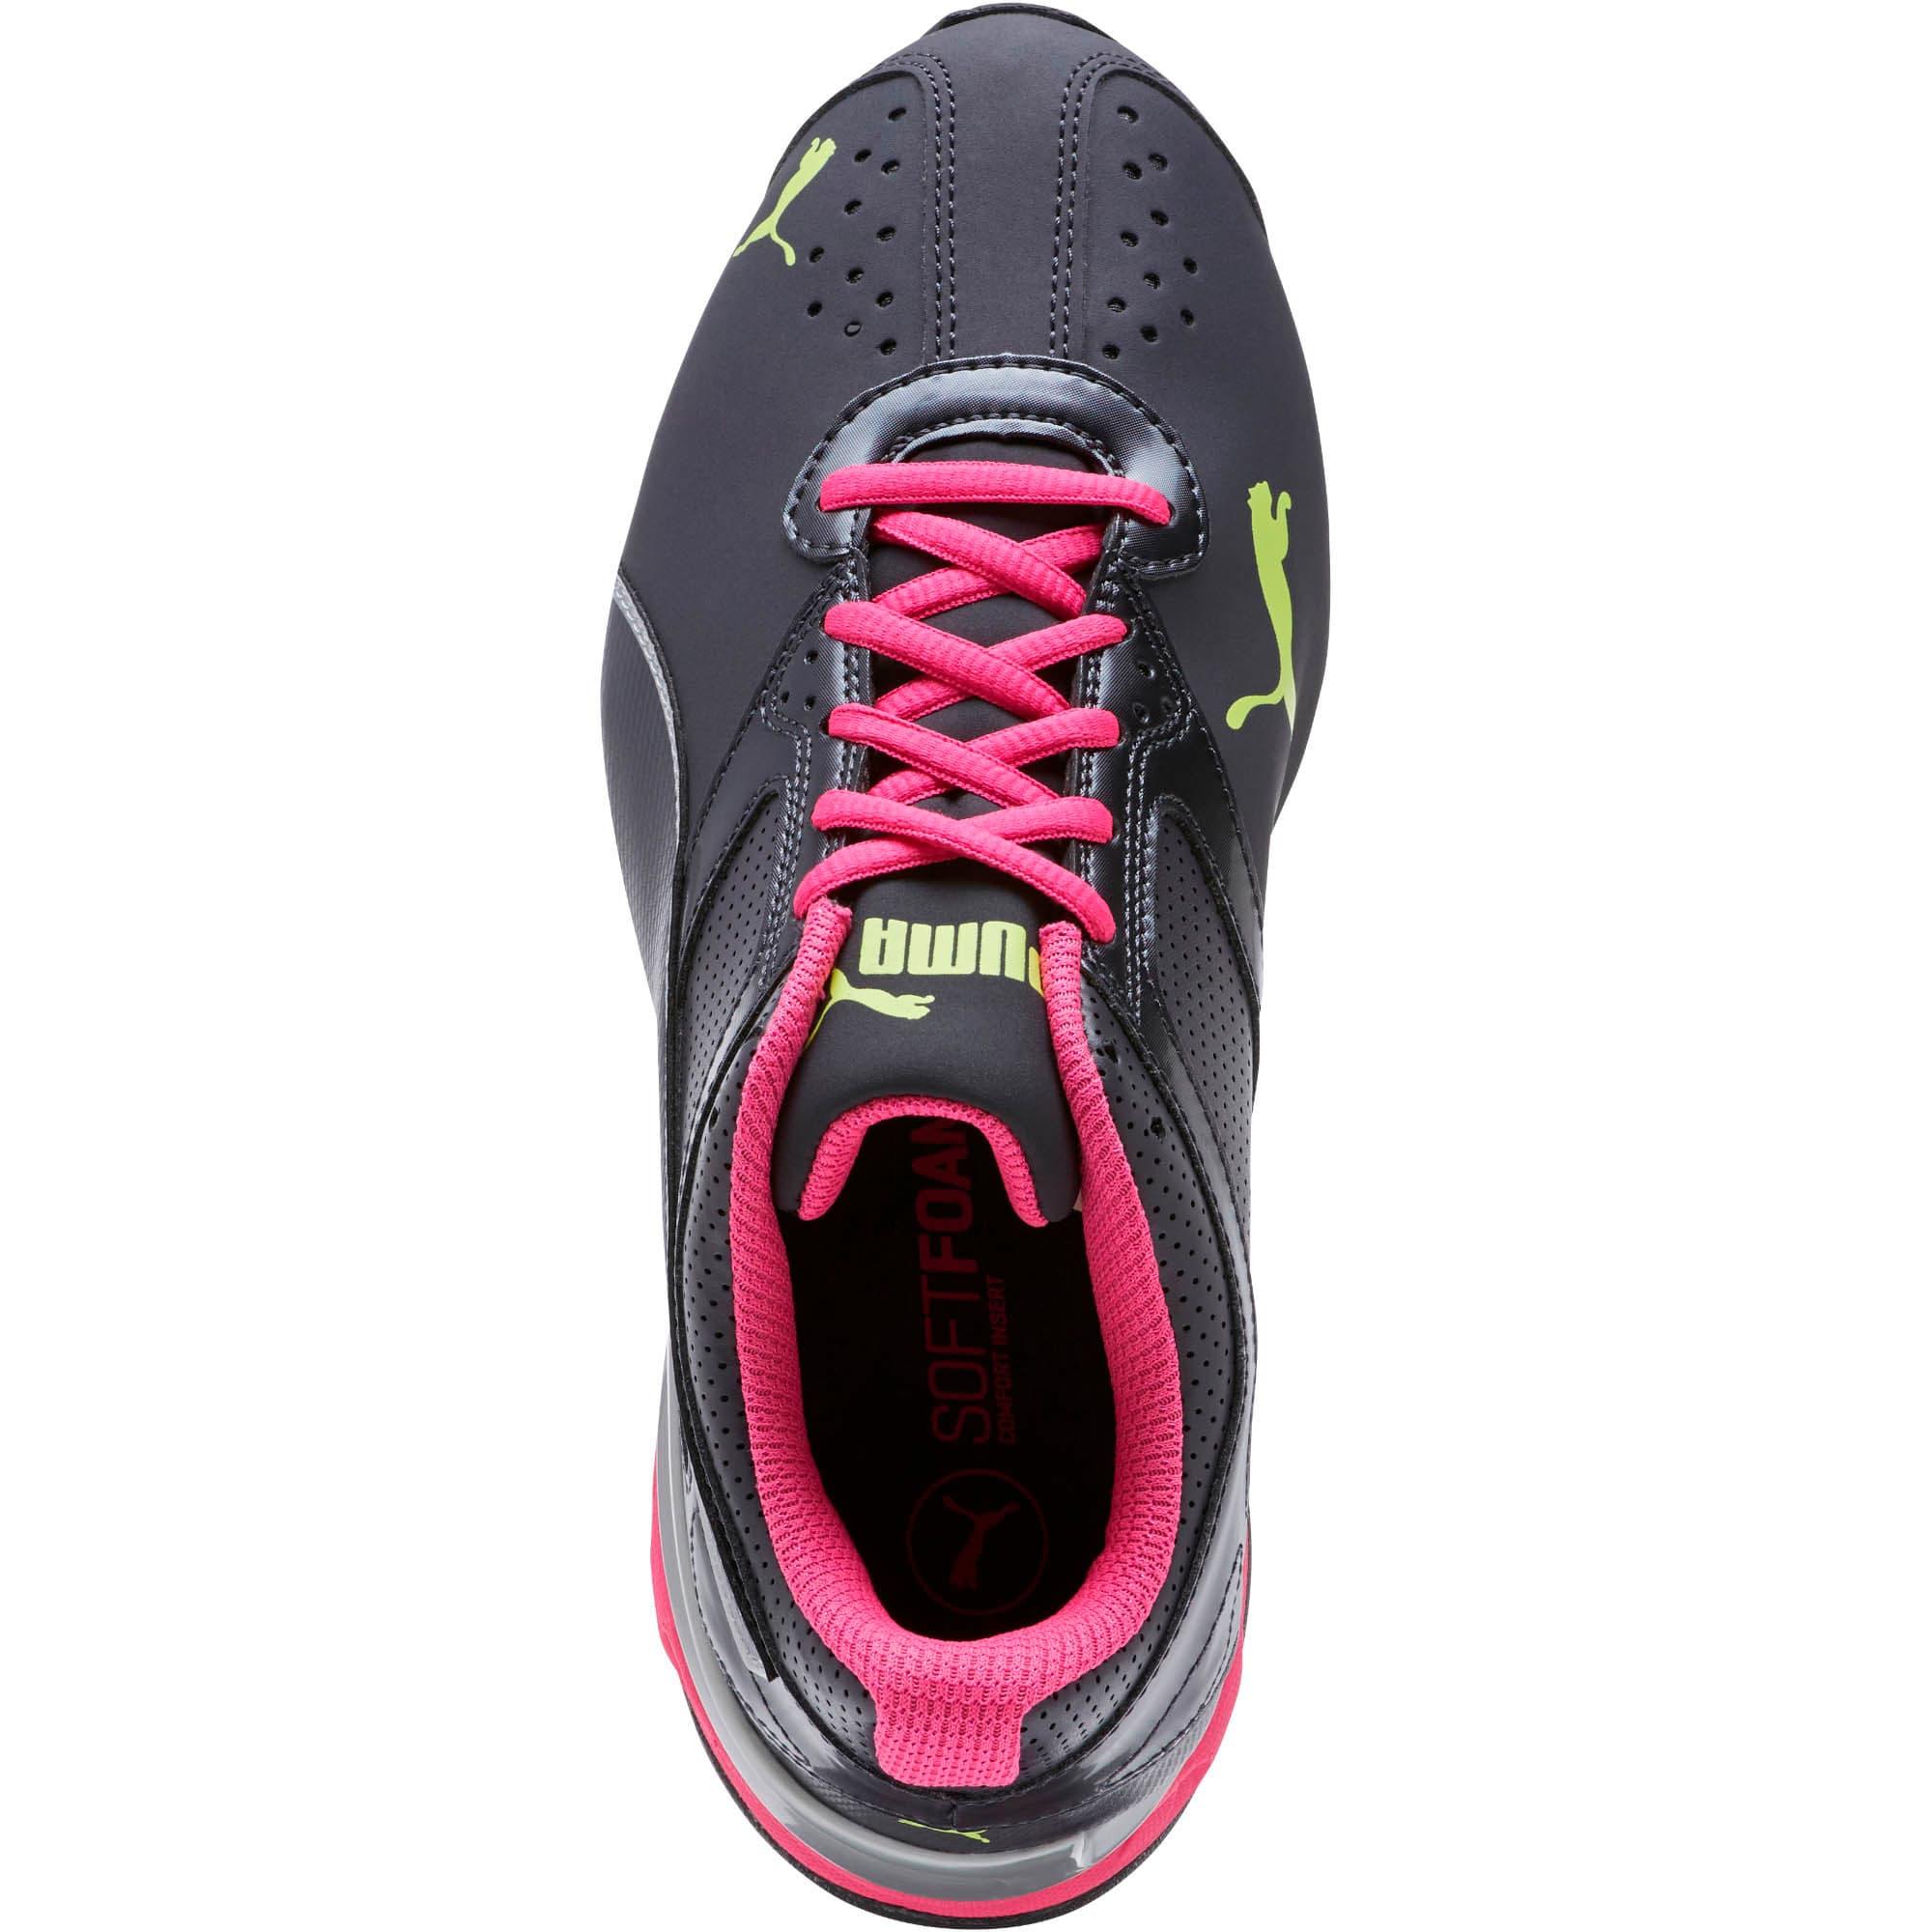 Thumbnail 5 of Tazon 6 FM Women's Sneakers, Periscope-Silver-Pink Glo, medium